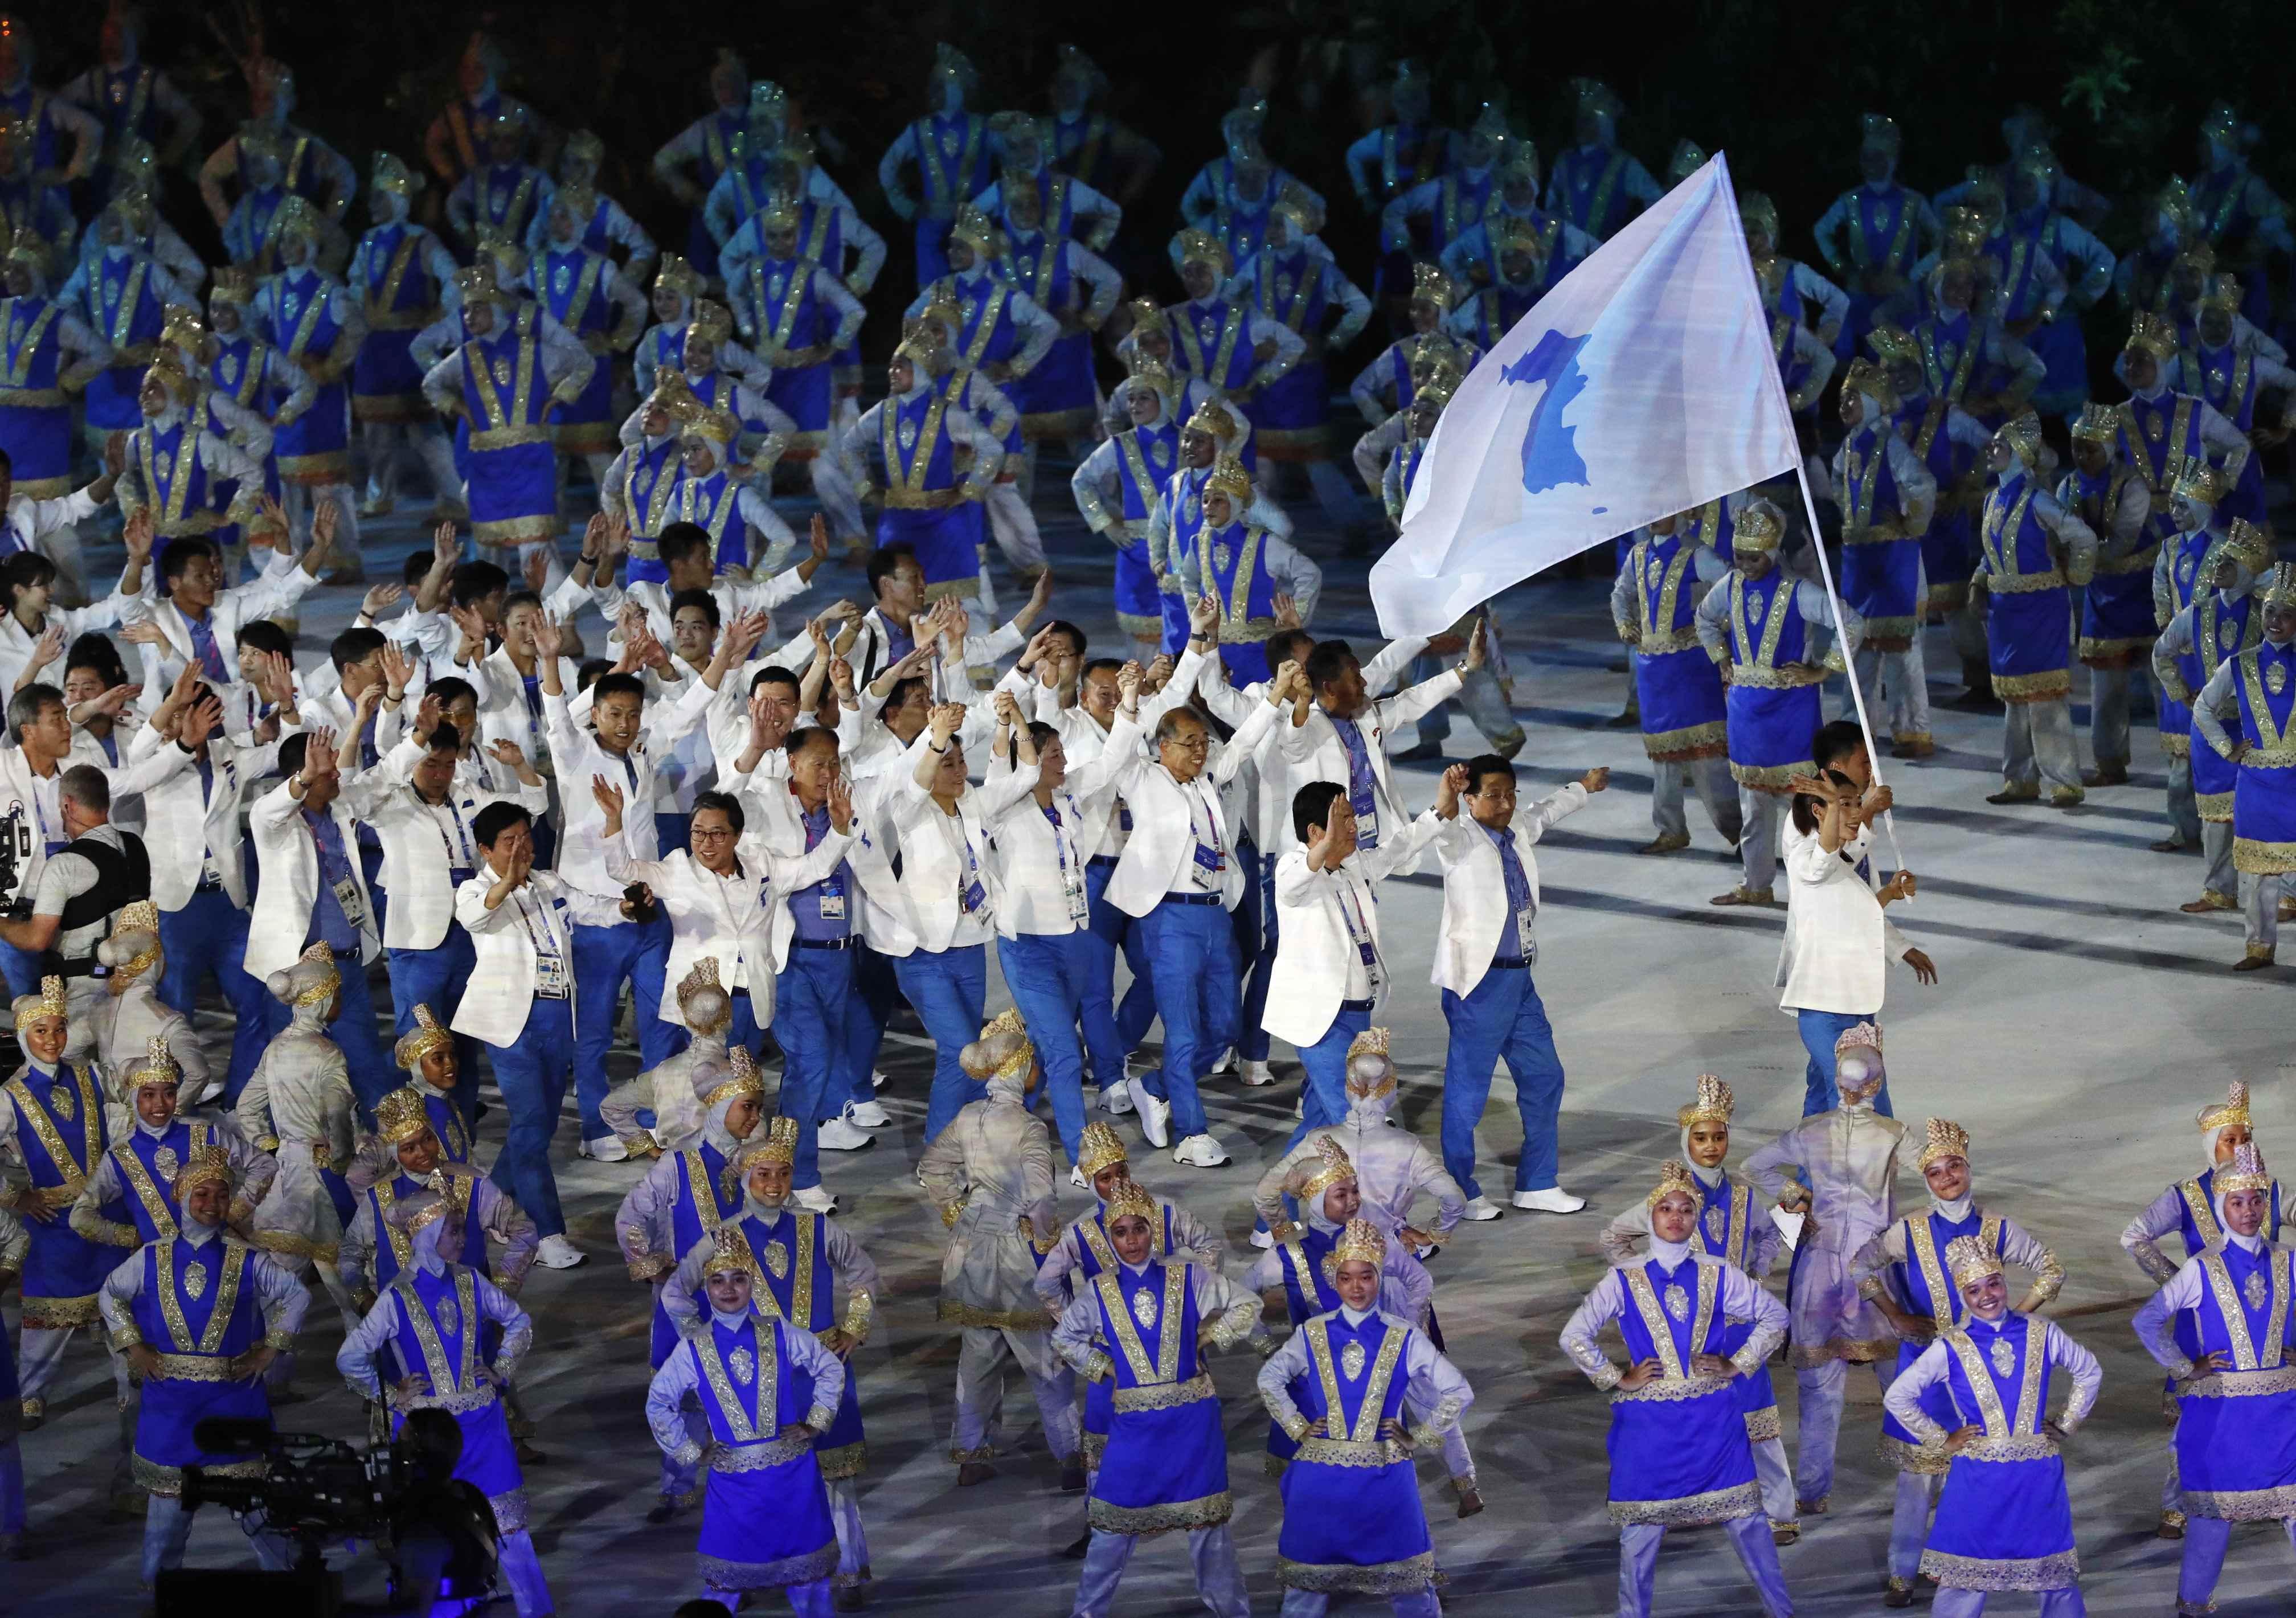 2018 Asian Games u2013 Opening ceremony - GBK Main Stadium u2013 Jakarta, Indonesia u2013 August 18, 2018 u2013 Athletes from the Unified Korea team march REUTERS